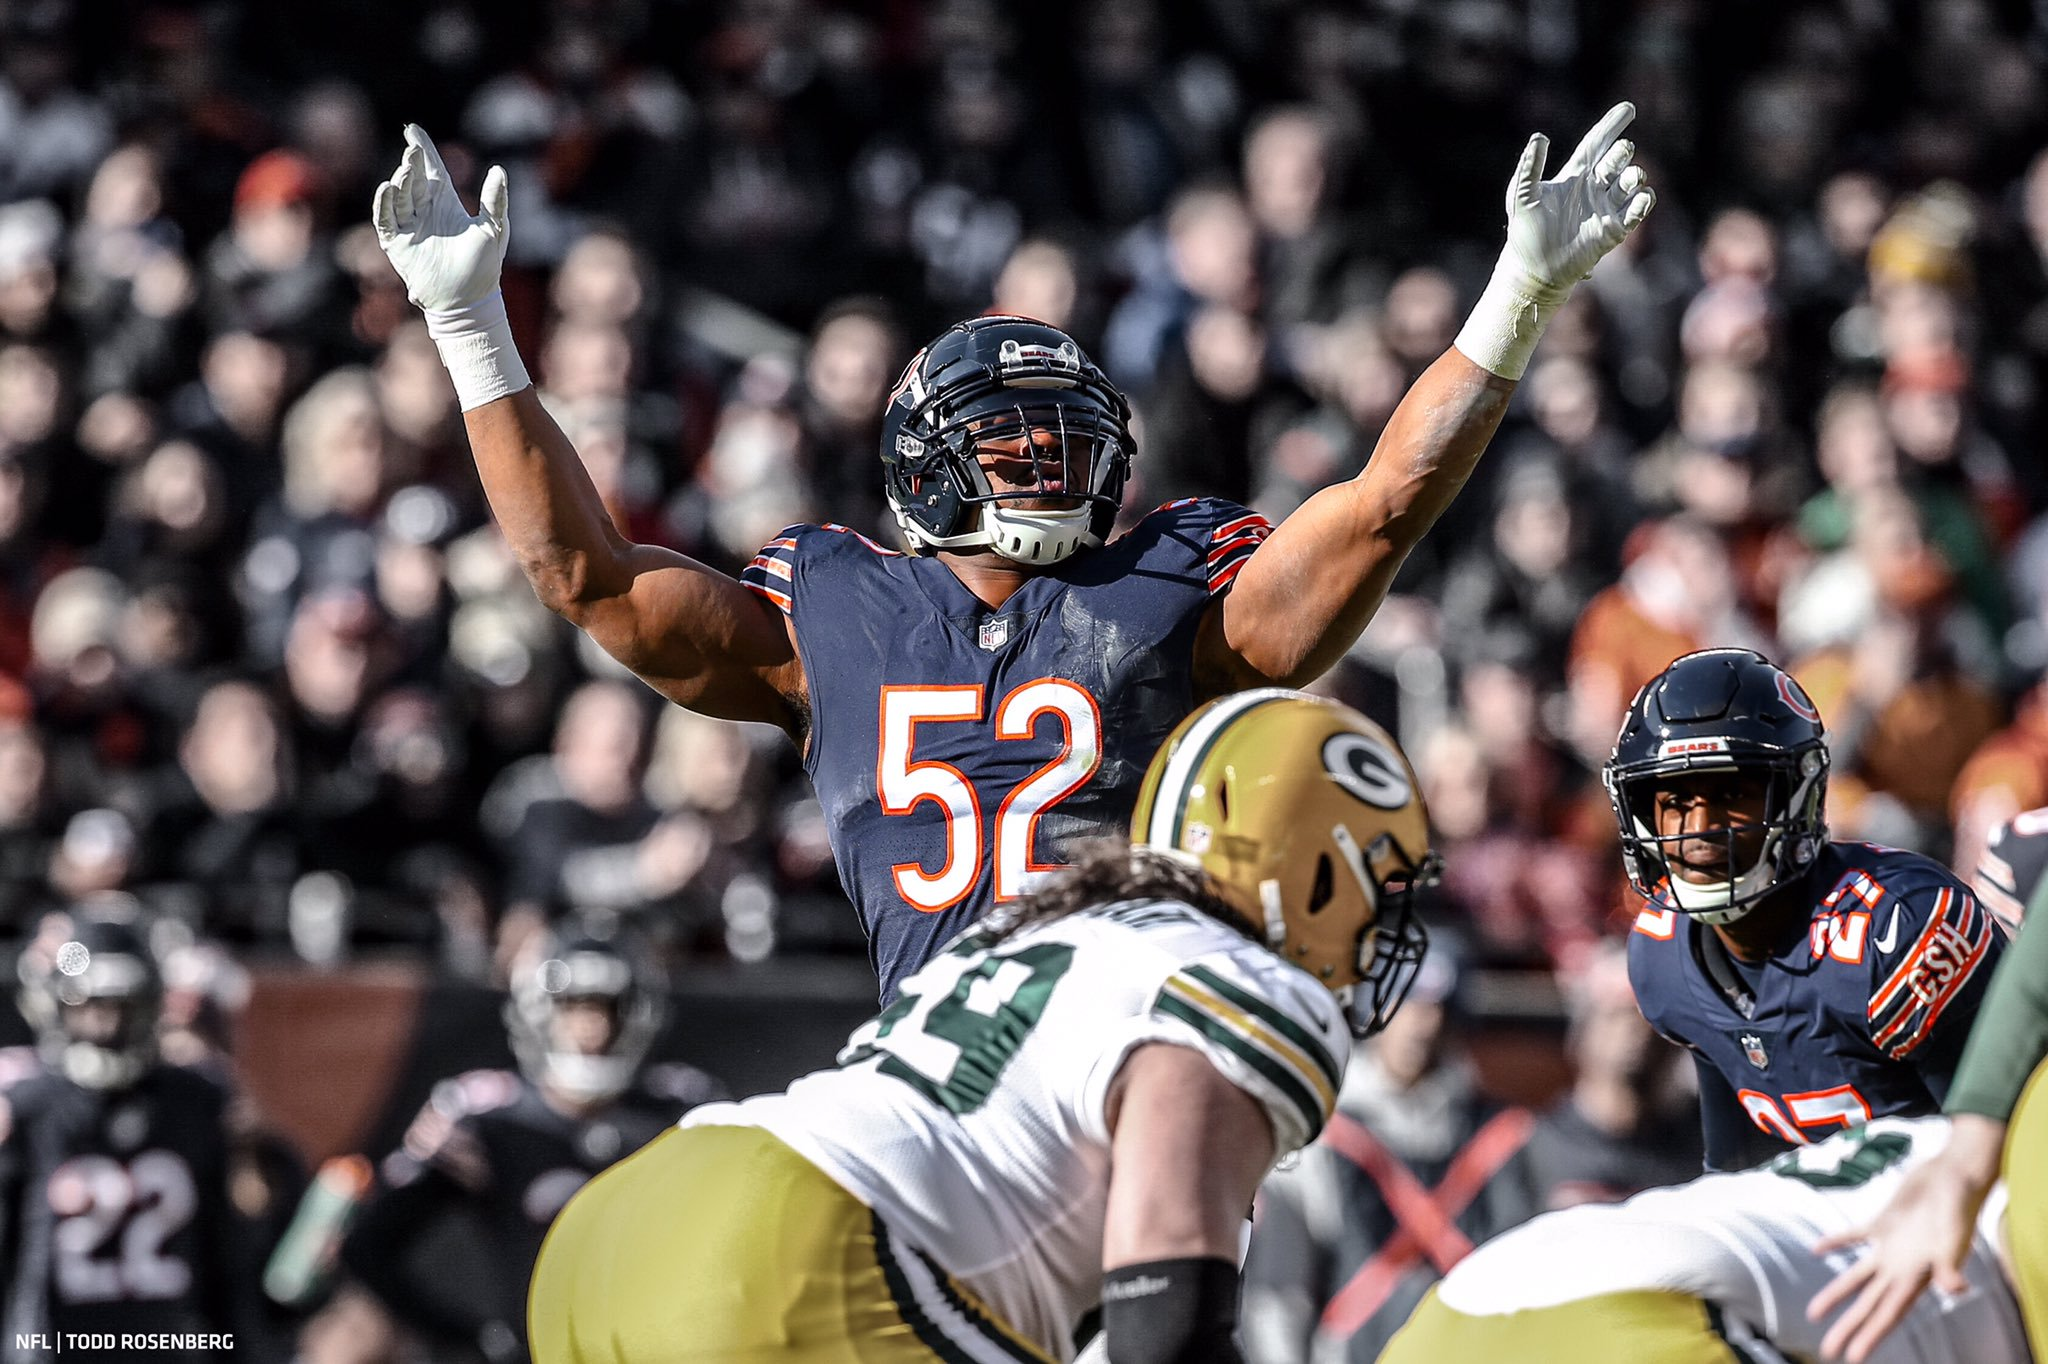 2019 NFL Week 1 Score Predictions